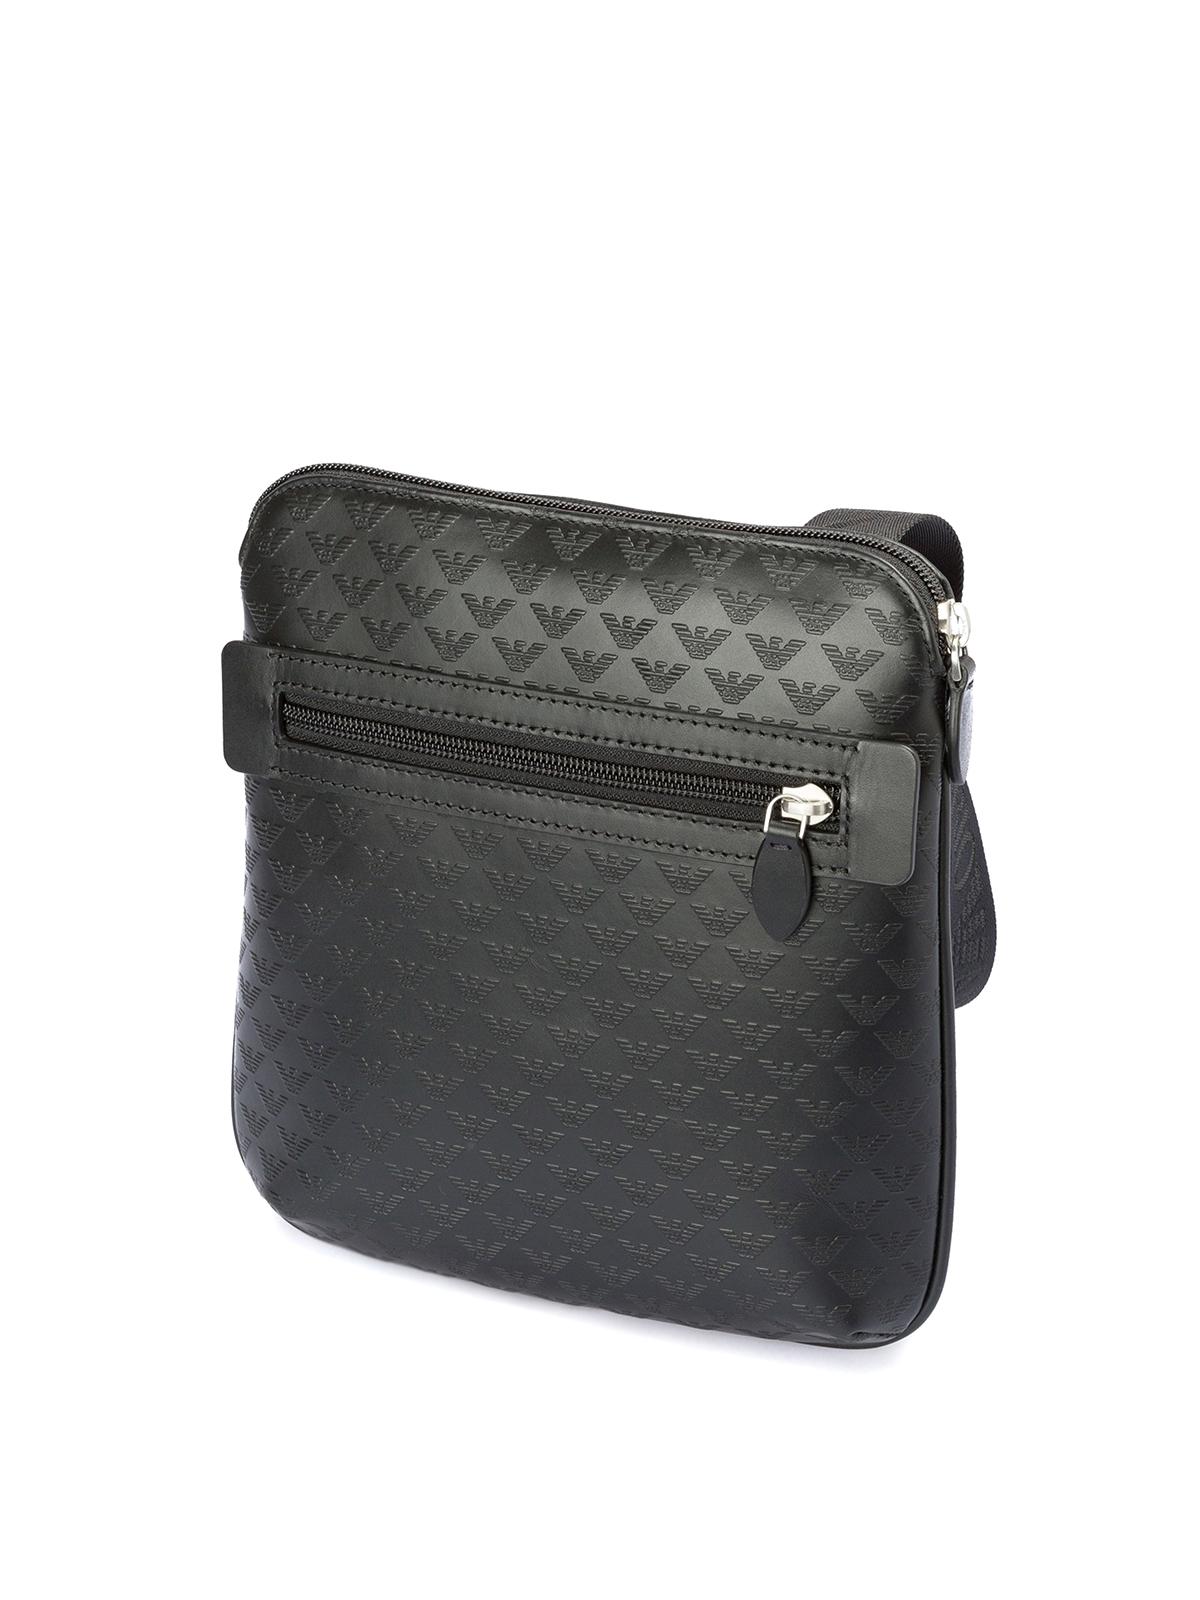 EMPORIO ARMANI  shoulder bags online - Printed leather flat messenger bag 5e1a74f7e6a89